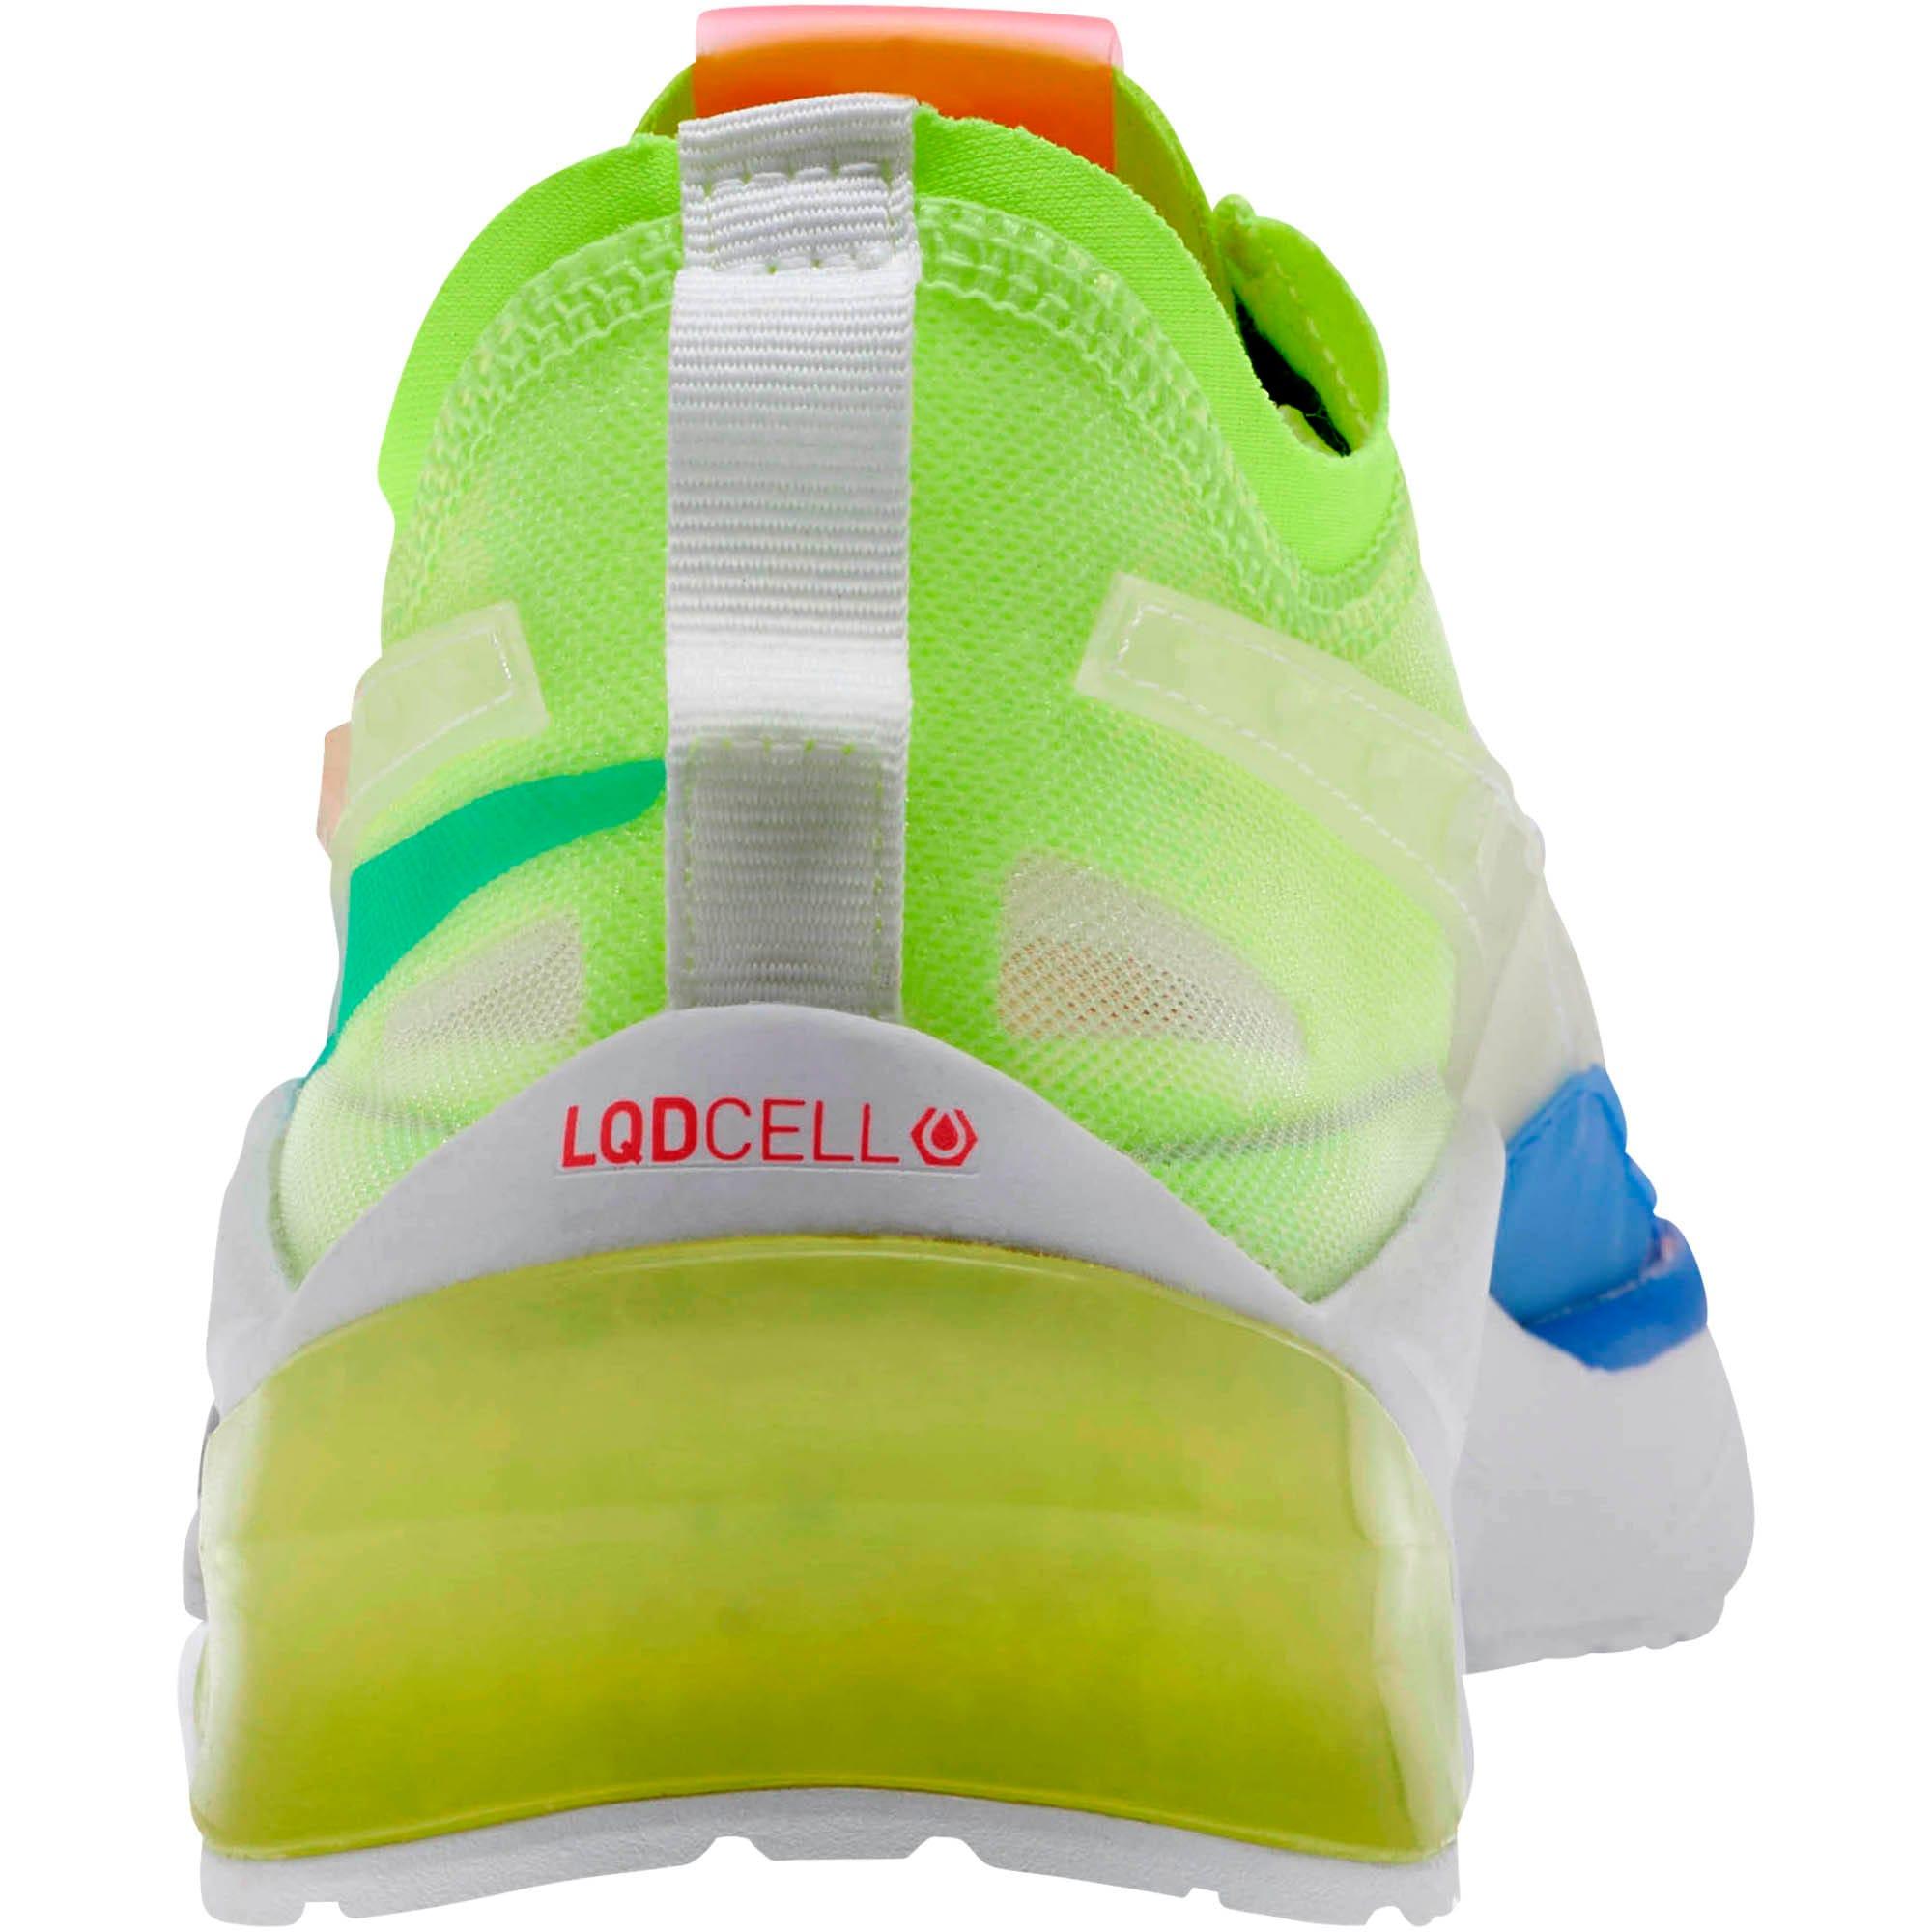 Thumbnail 3 of LQDCELL Optic Sheer Women's Training Shoes, Puma White, medium